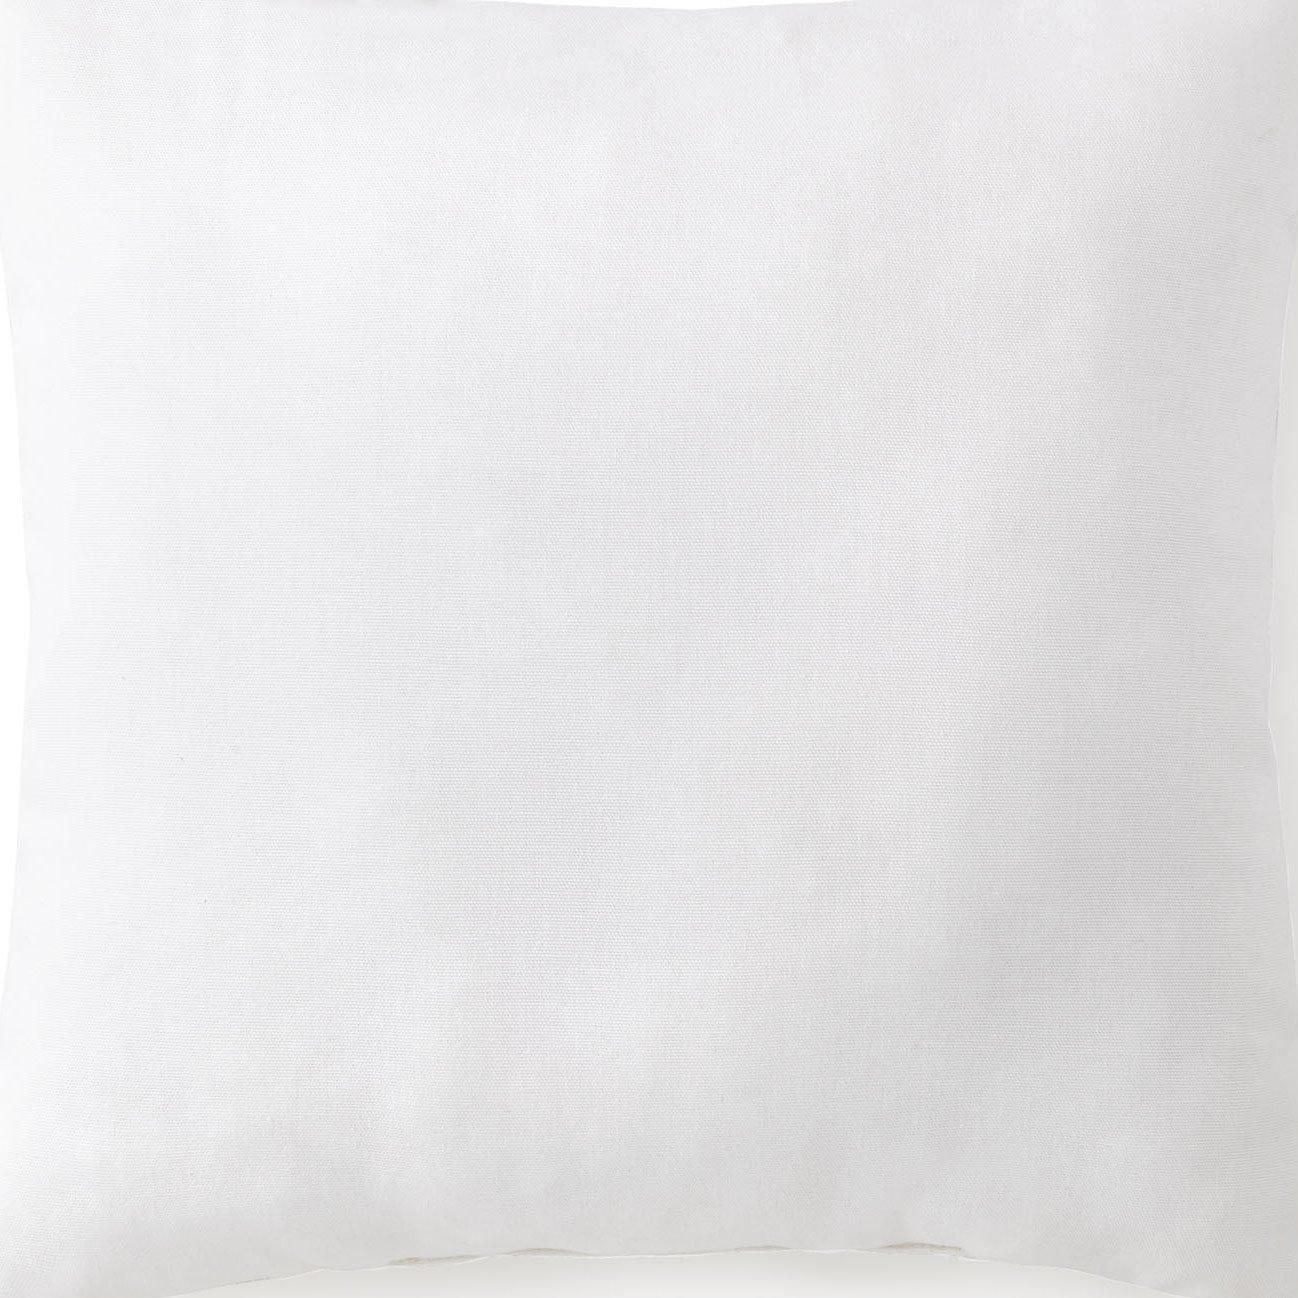 Poppy Plaid Solid Linen Fabric Per Yard